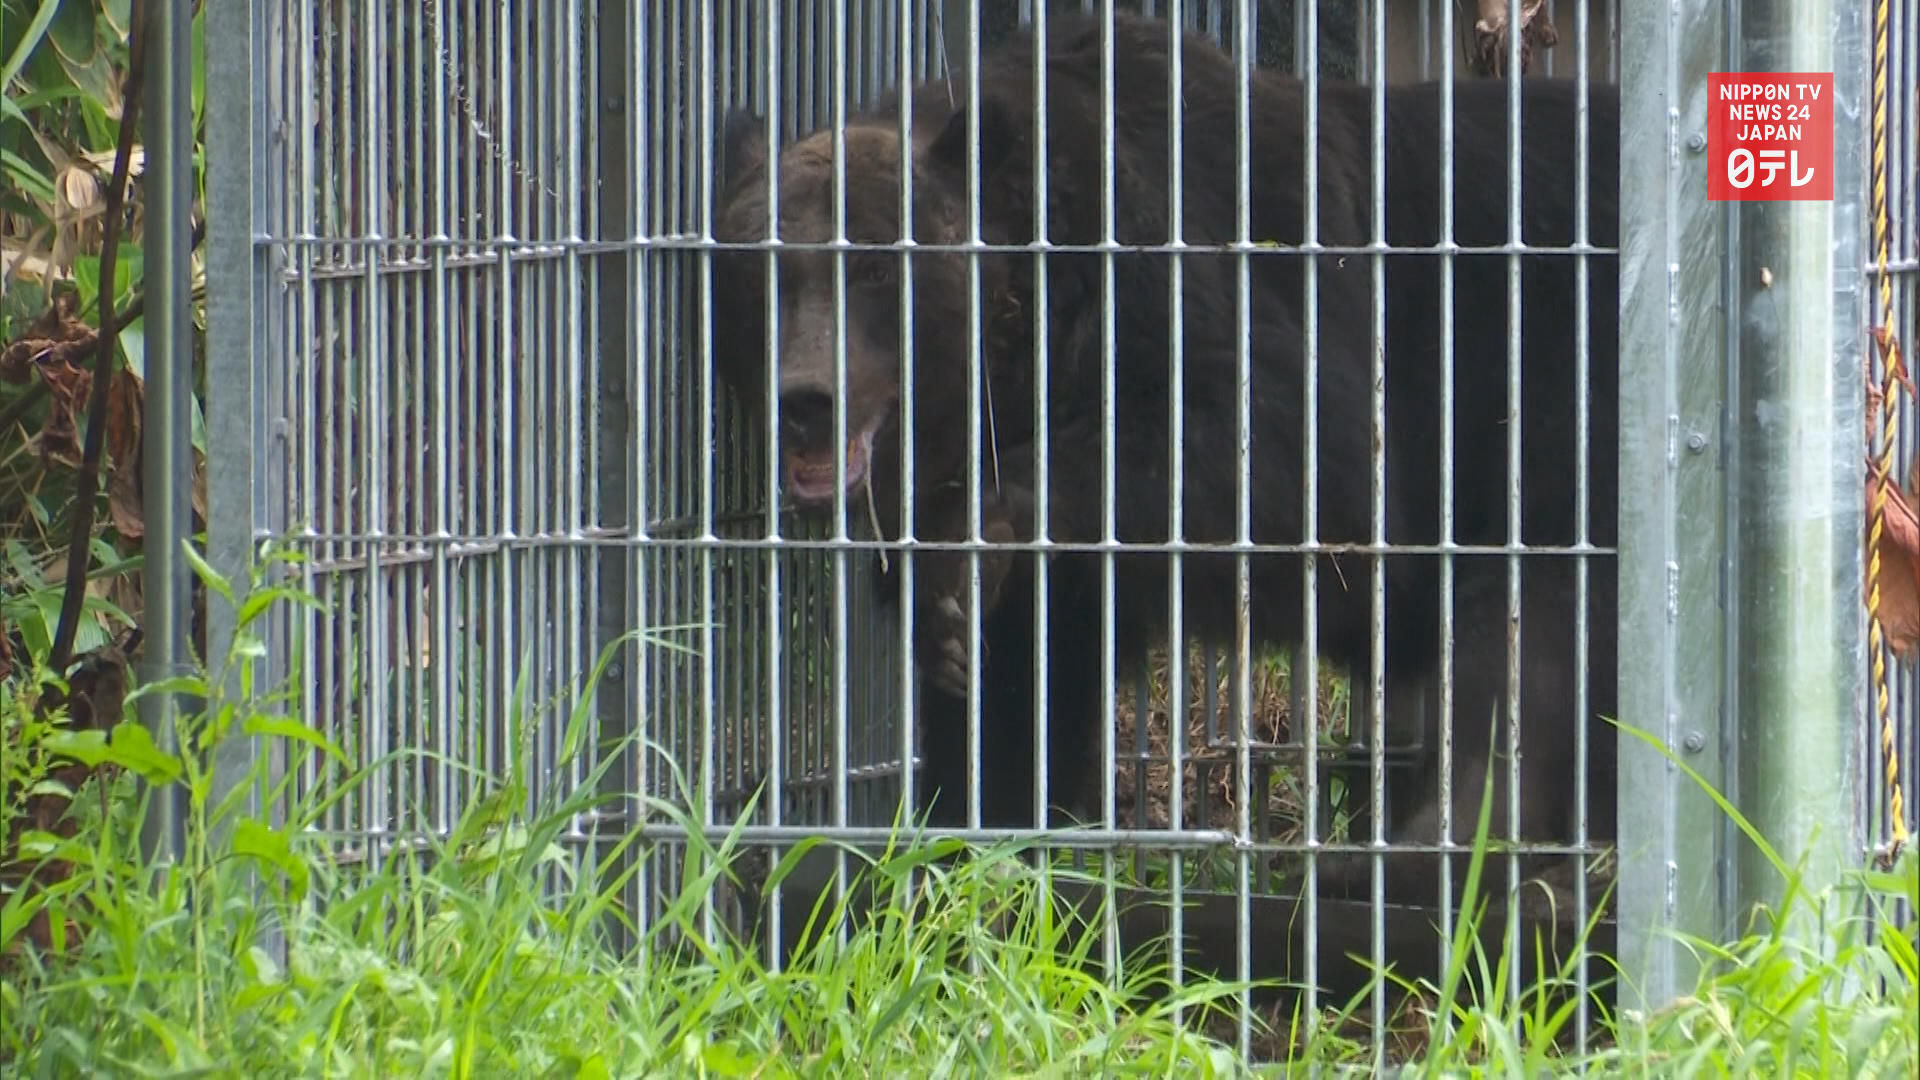 Bear caught in Hokkaido